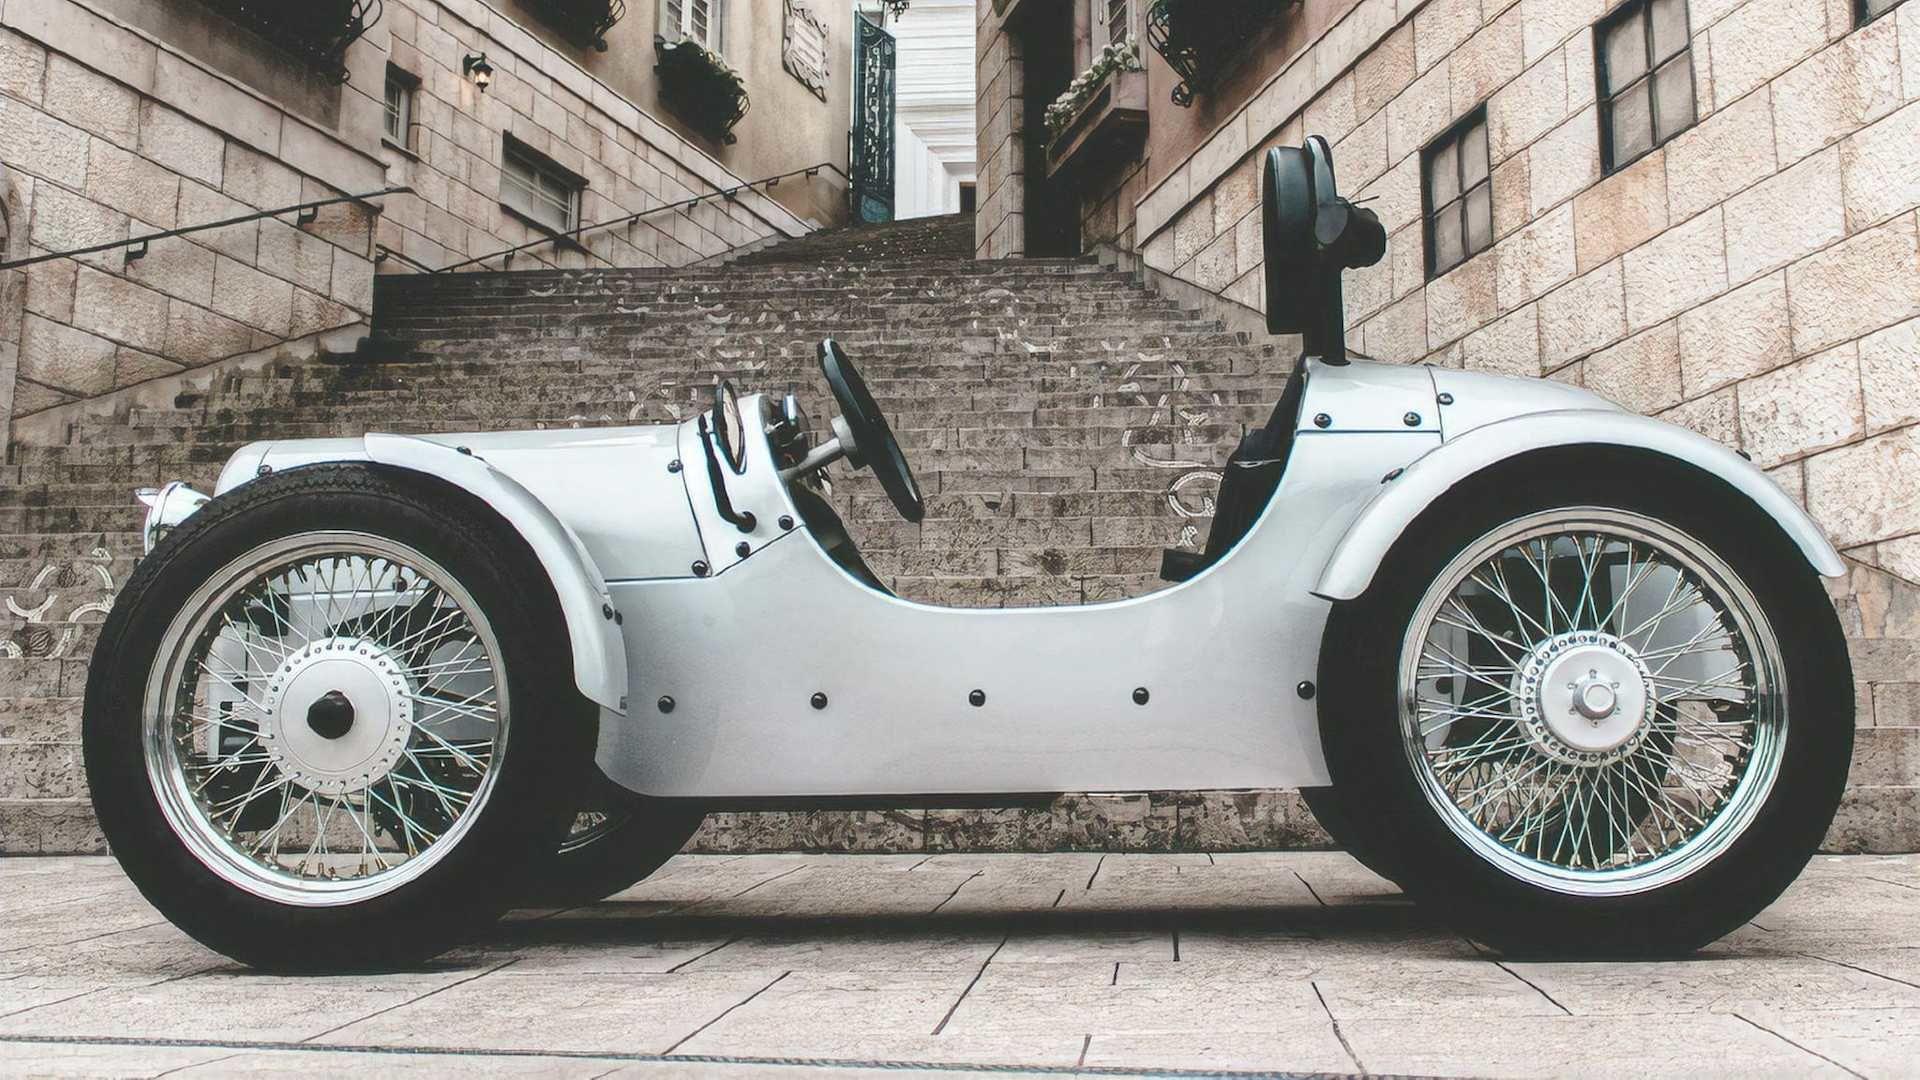 Blaze EV Classic 可謂是充滿復古魅力的單座電動車